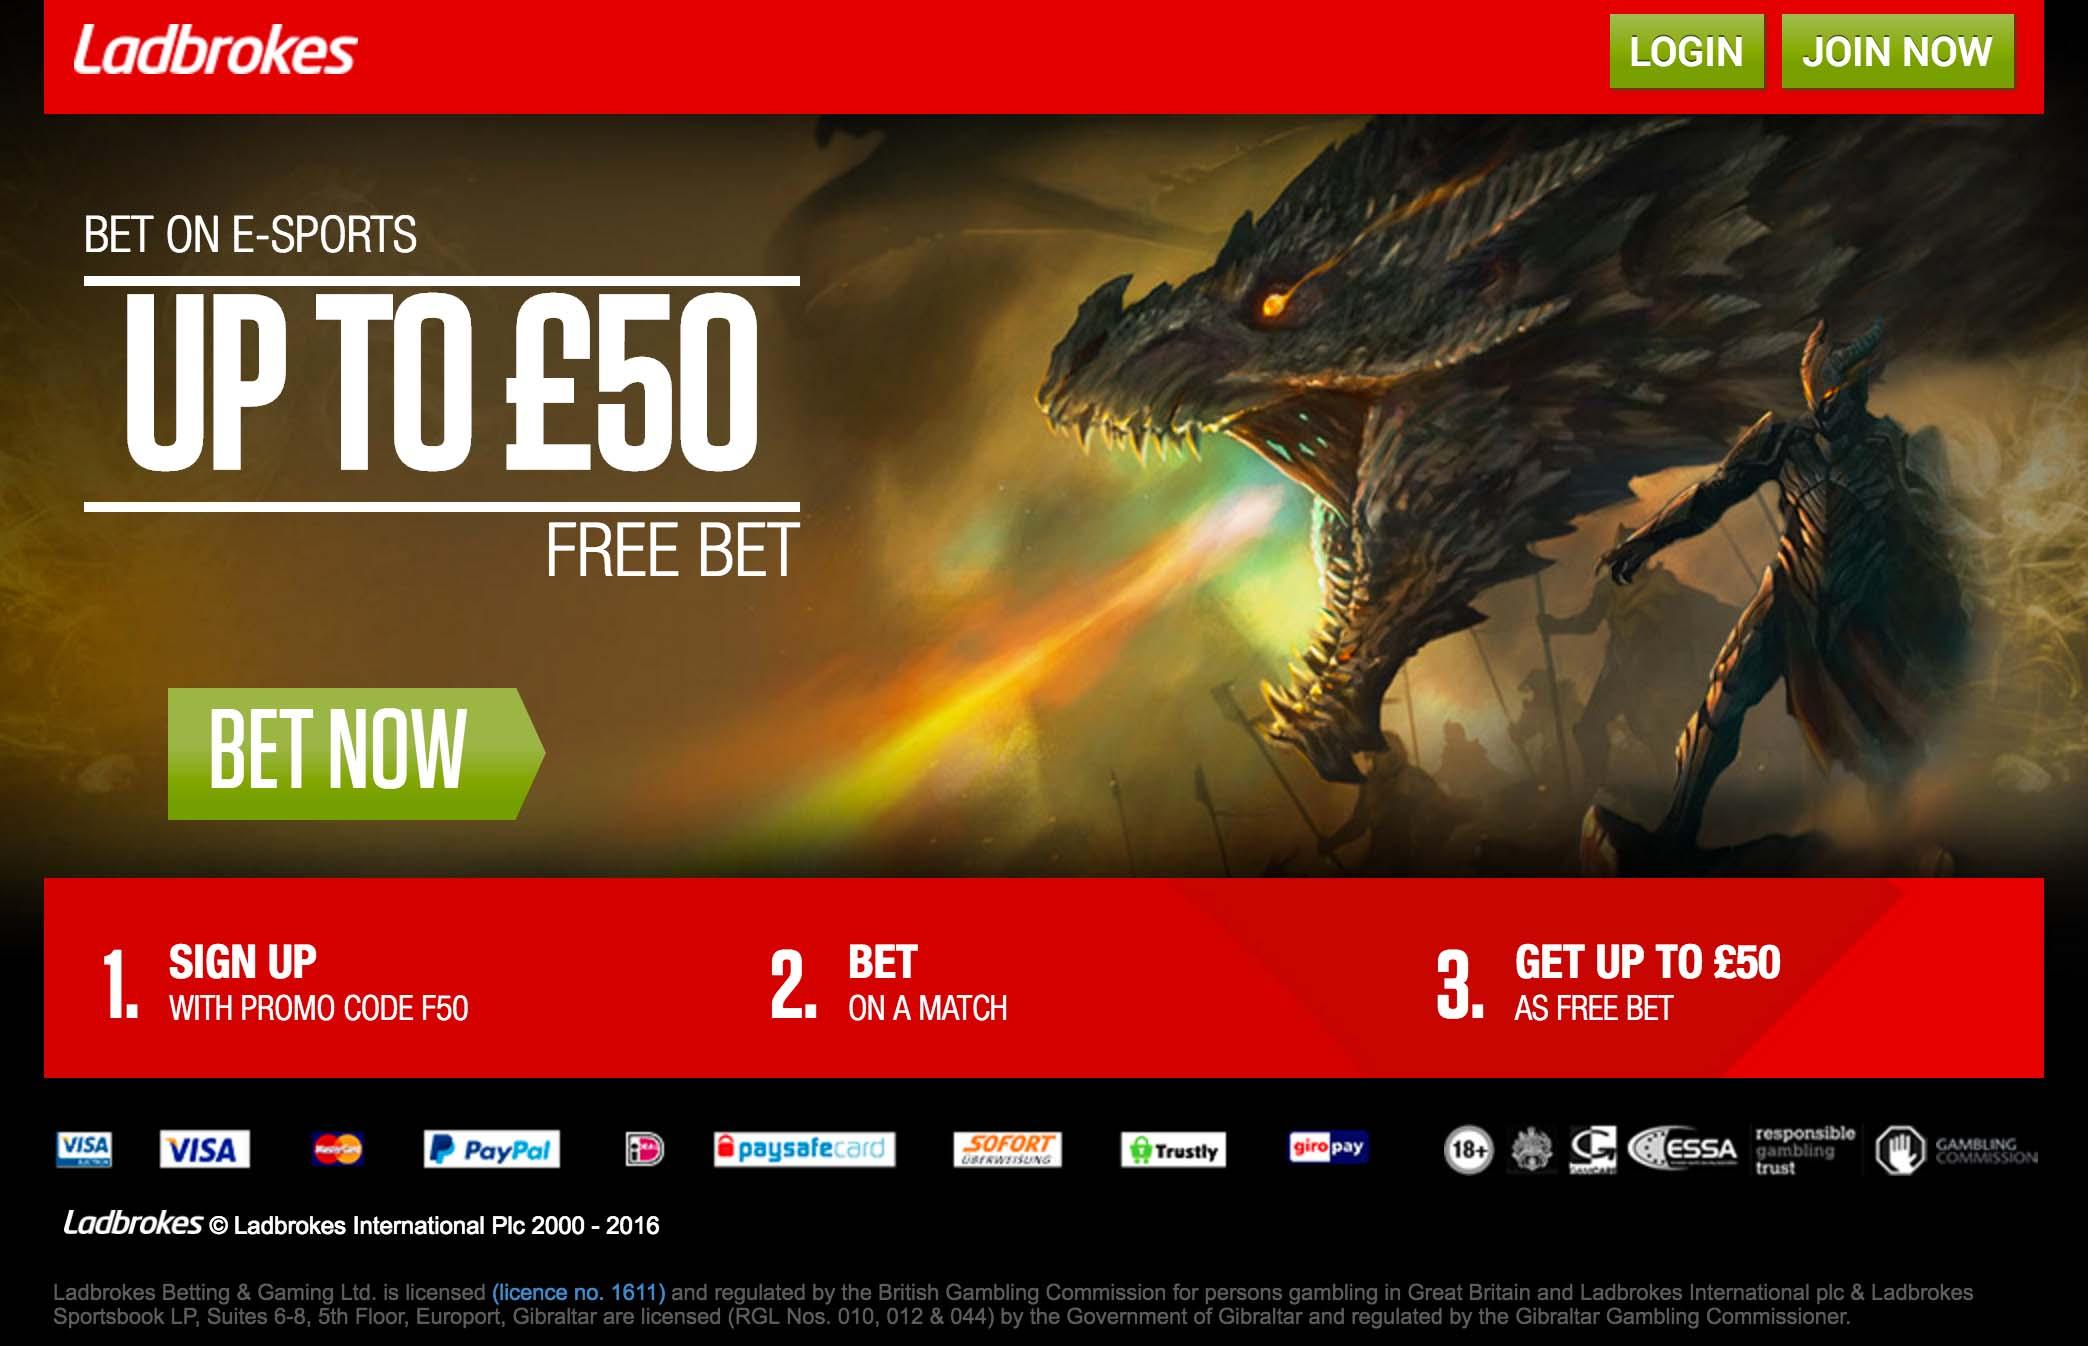 Ladbrokes eSports Betting Review and Unique eSports Welcome Bonus